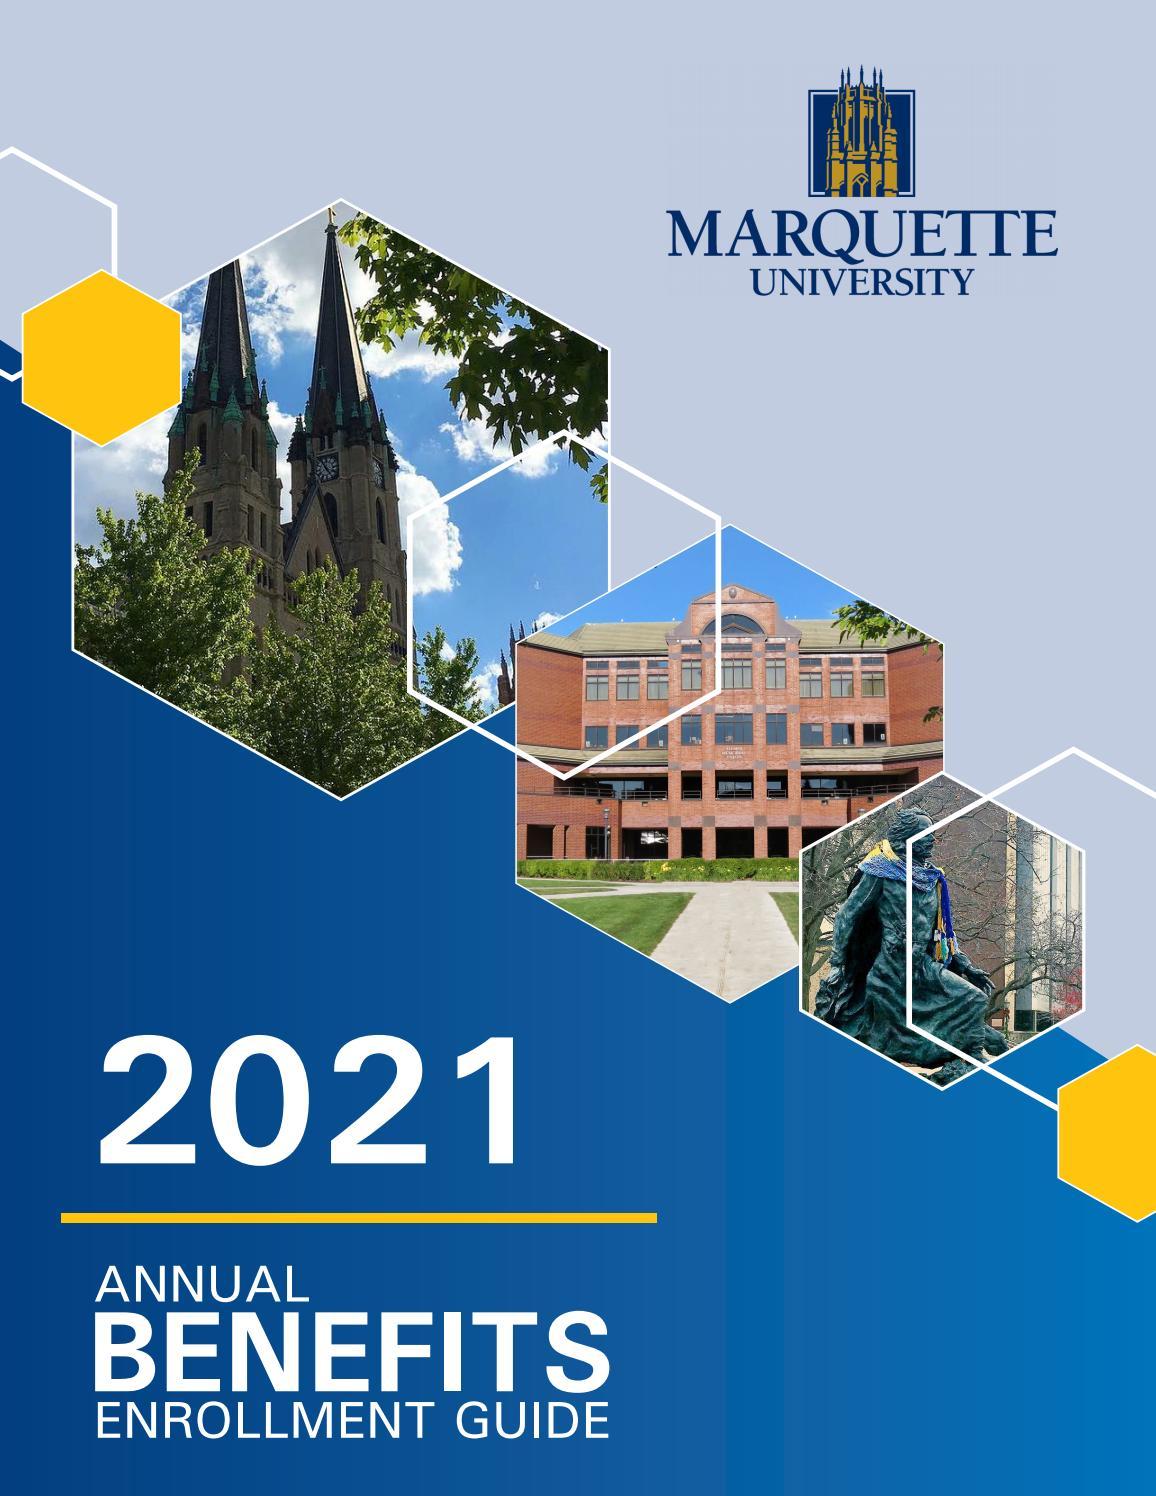 Marquette Academic Calendar 2022.2021 Marquette Open Enrollment Guide By Marquette University Issuu